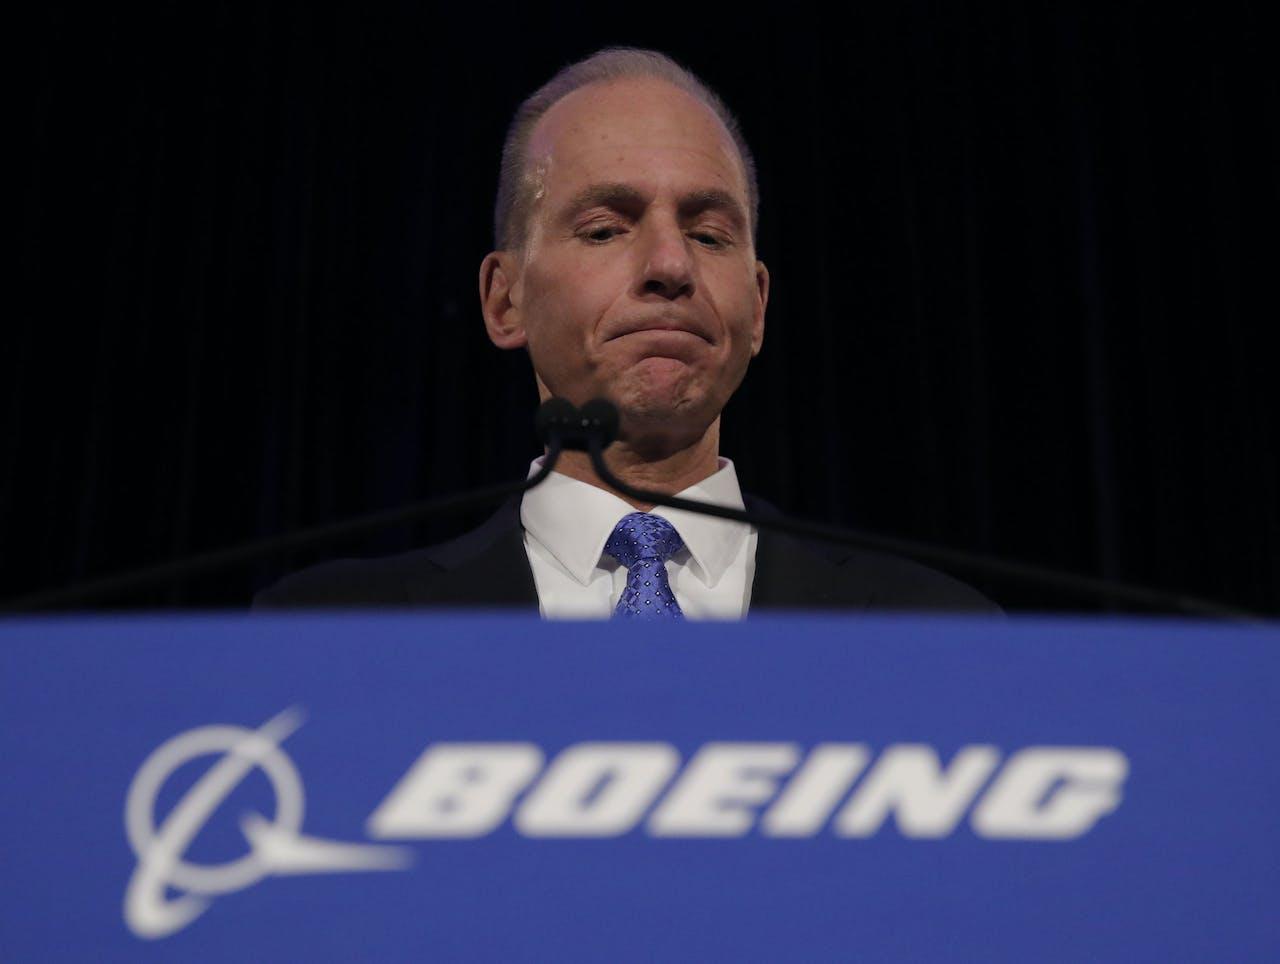 Boeing Chief Executive Dennis Muilenburg Photo by JOHN GRESS / POOL / AFP